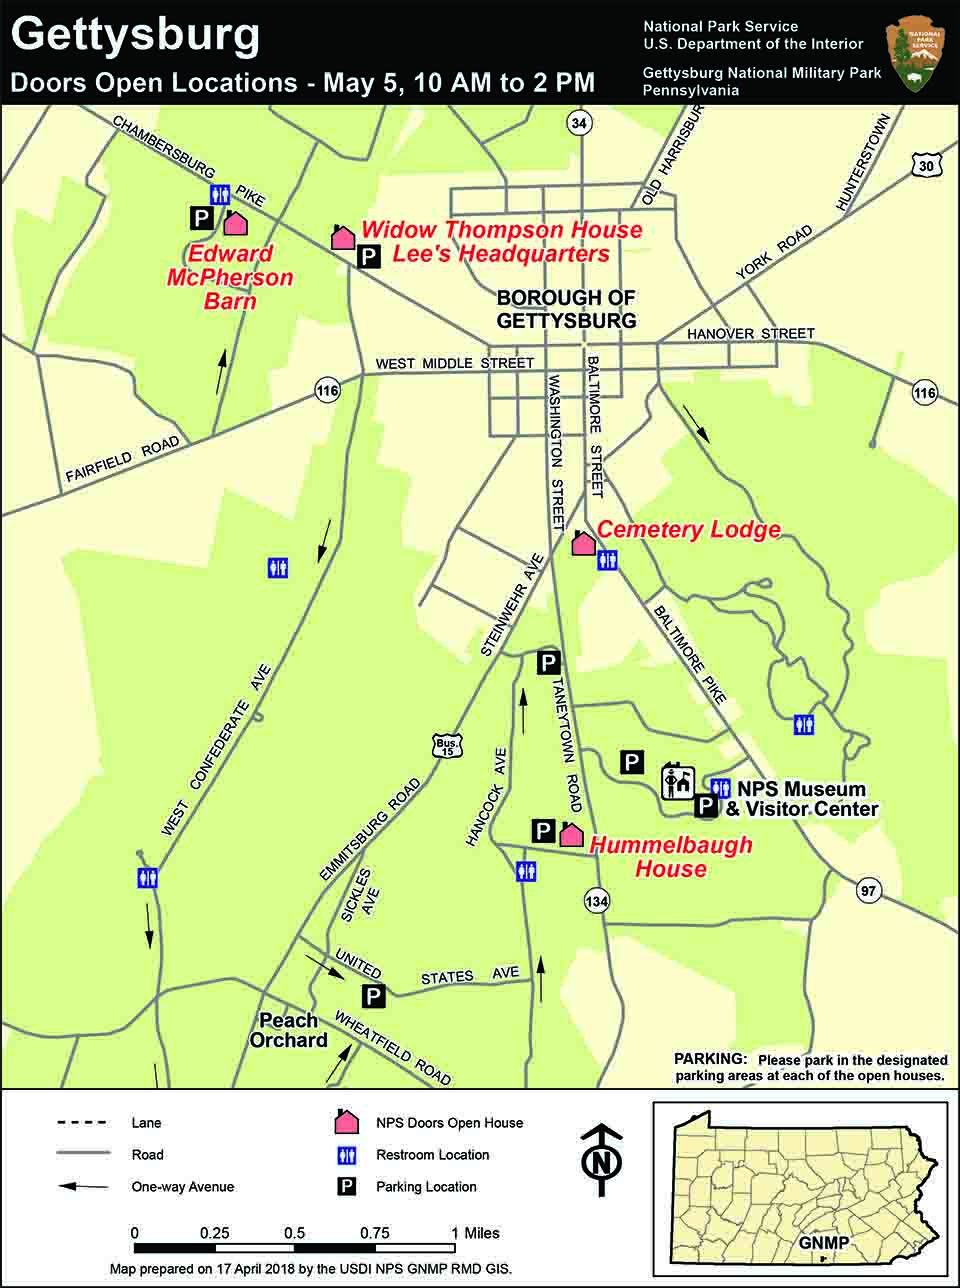 Event Details Gettysburg National Military Park Us National - Gettysburg-on-us-map